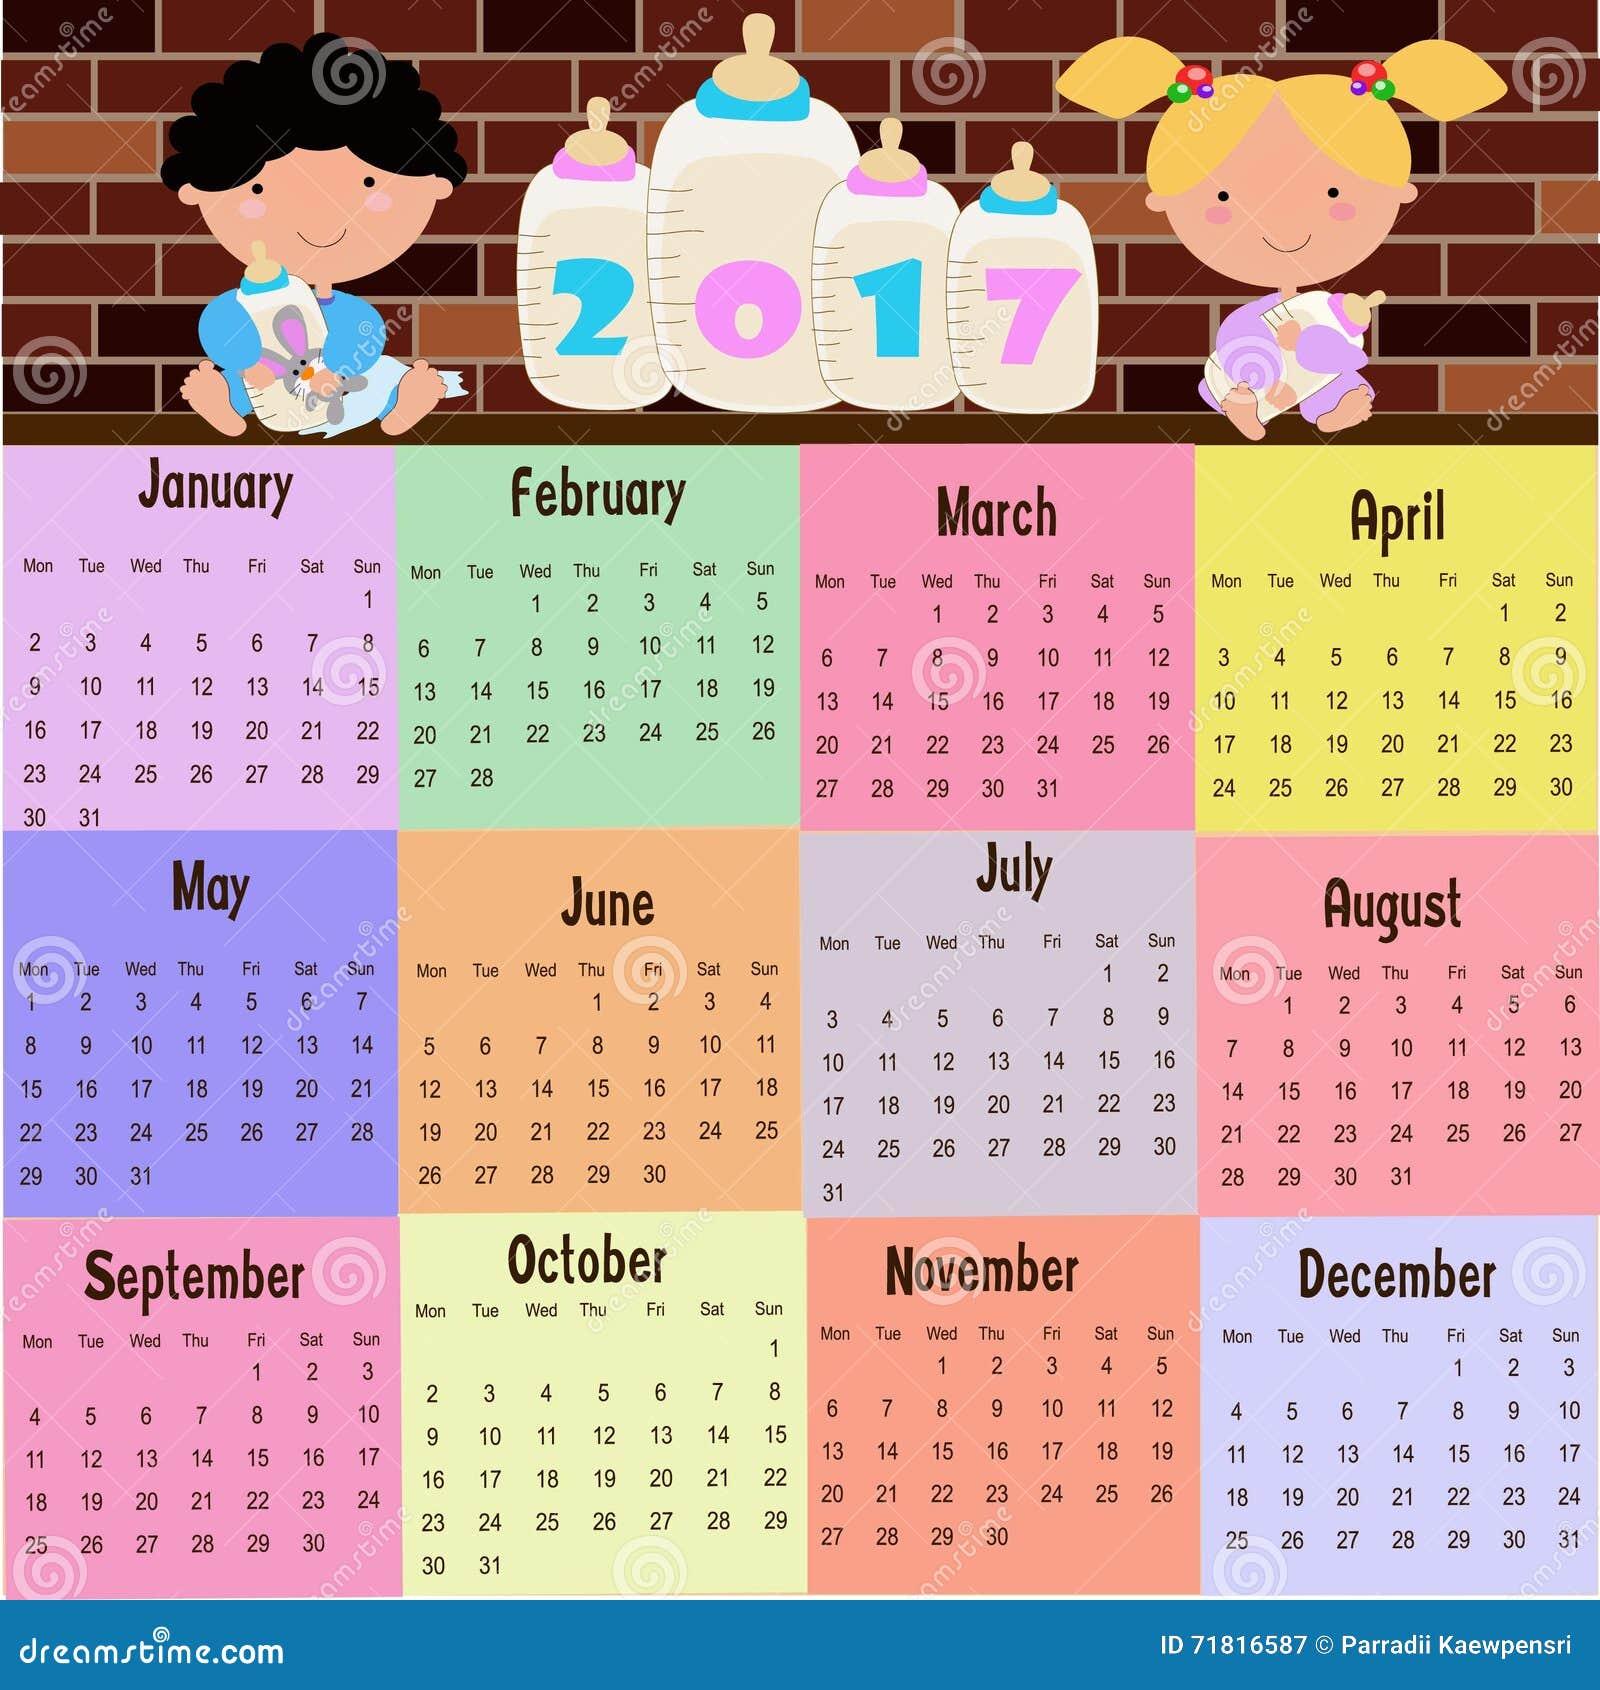 2017 photo calendar